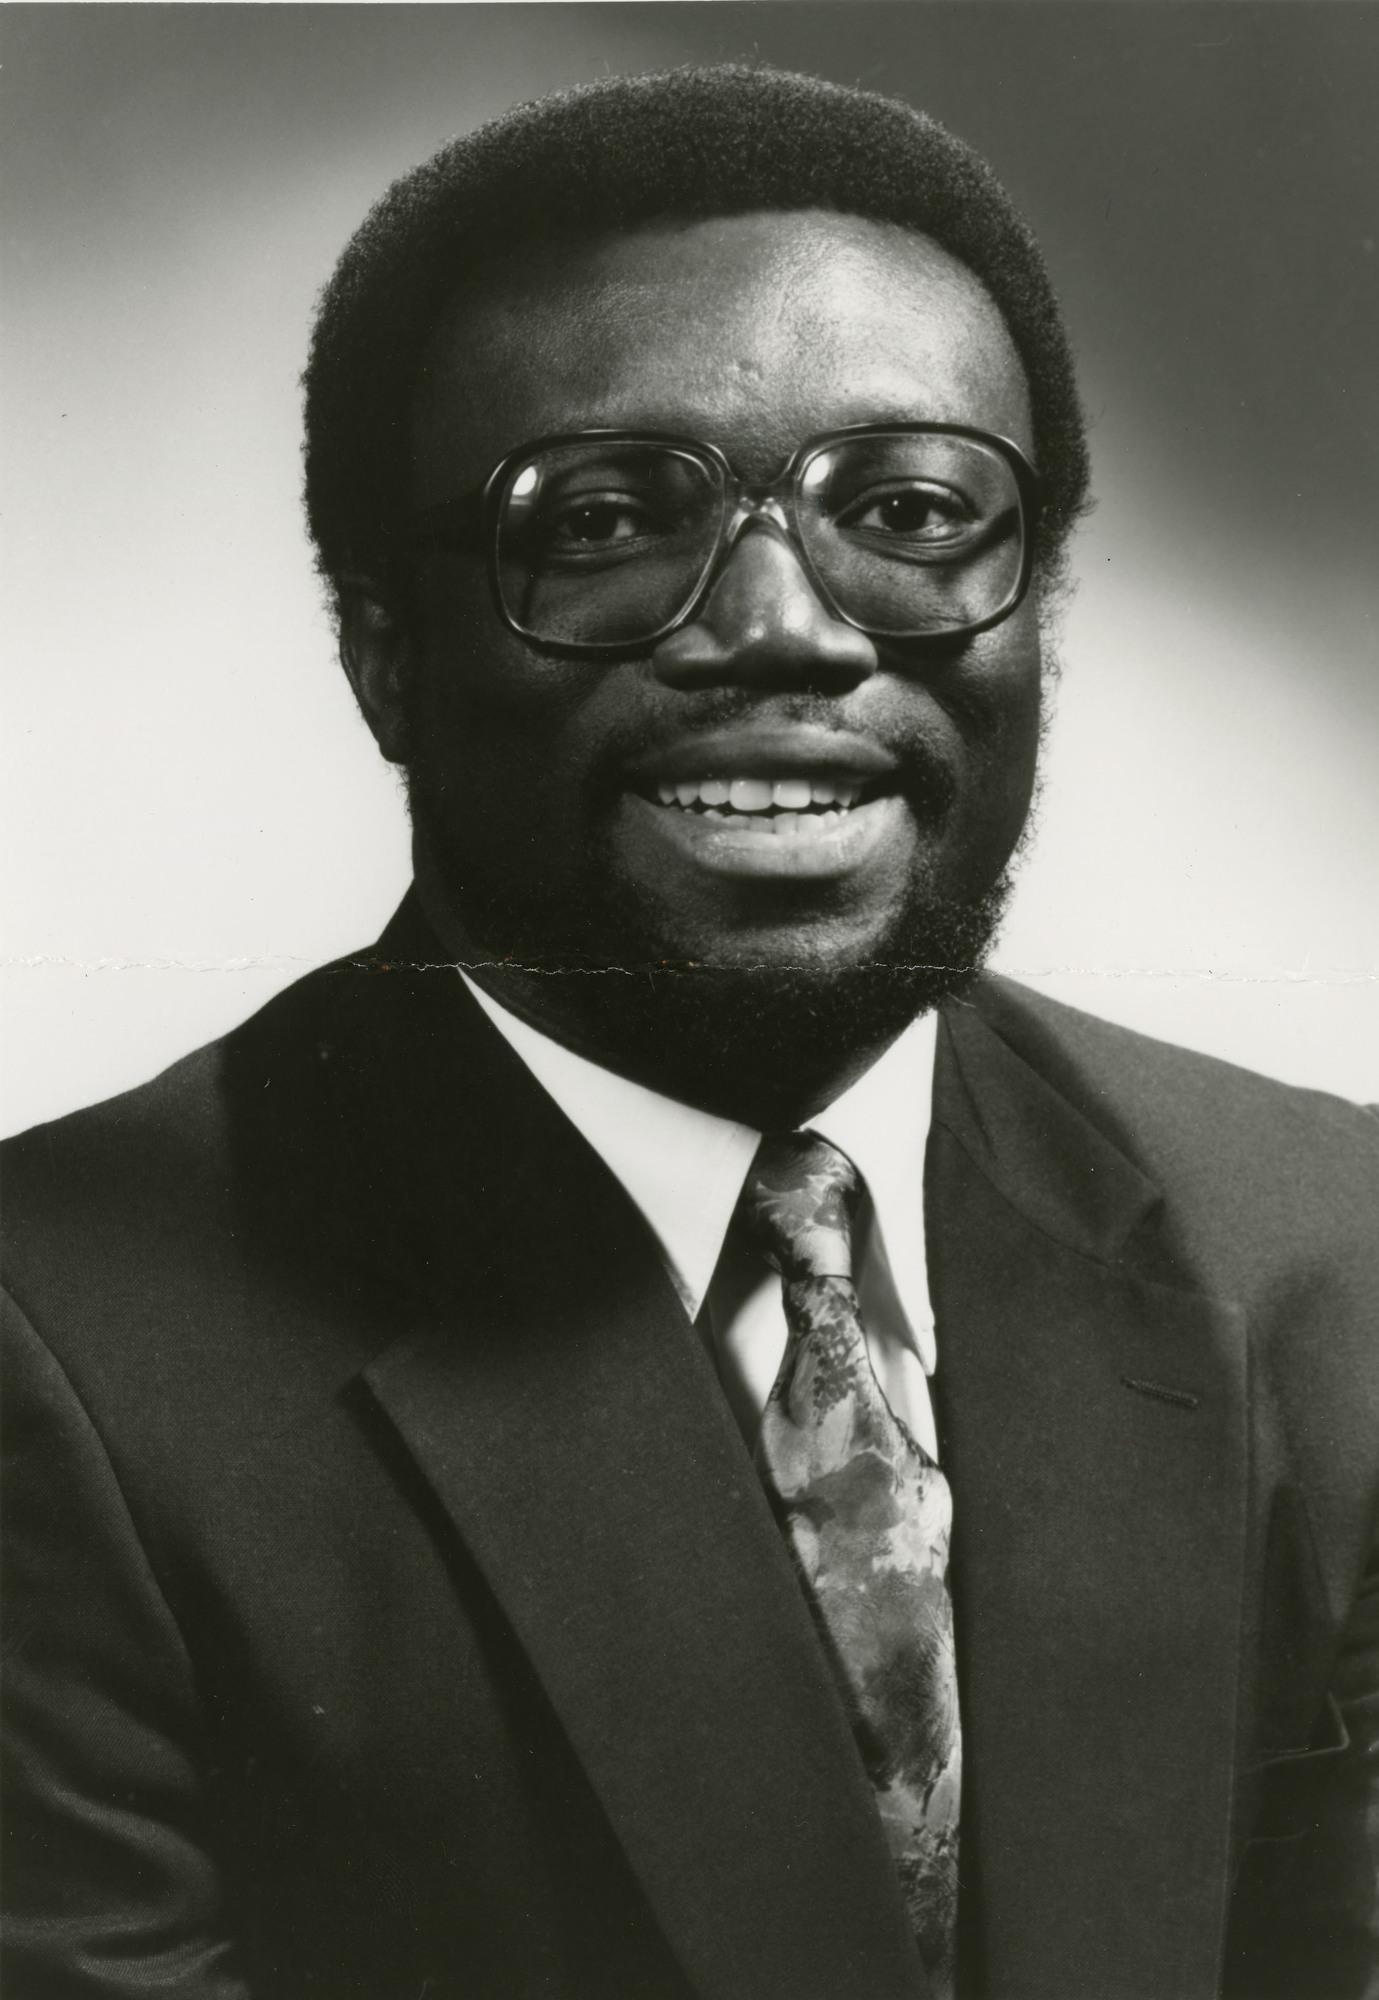 http://spec.lib.vt.edu/pickup/Omeka_upload/Kwansa_Francis_1992.jpg